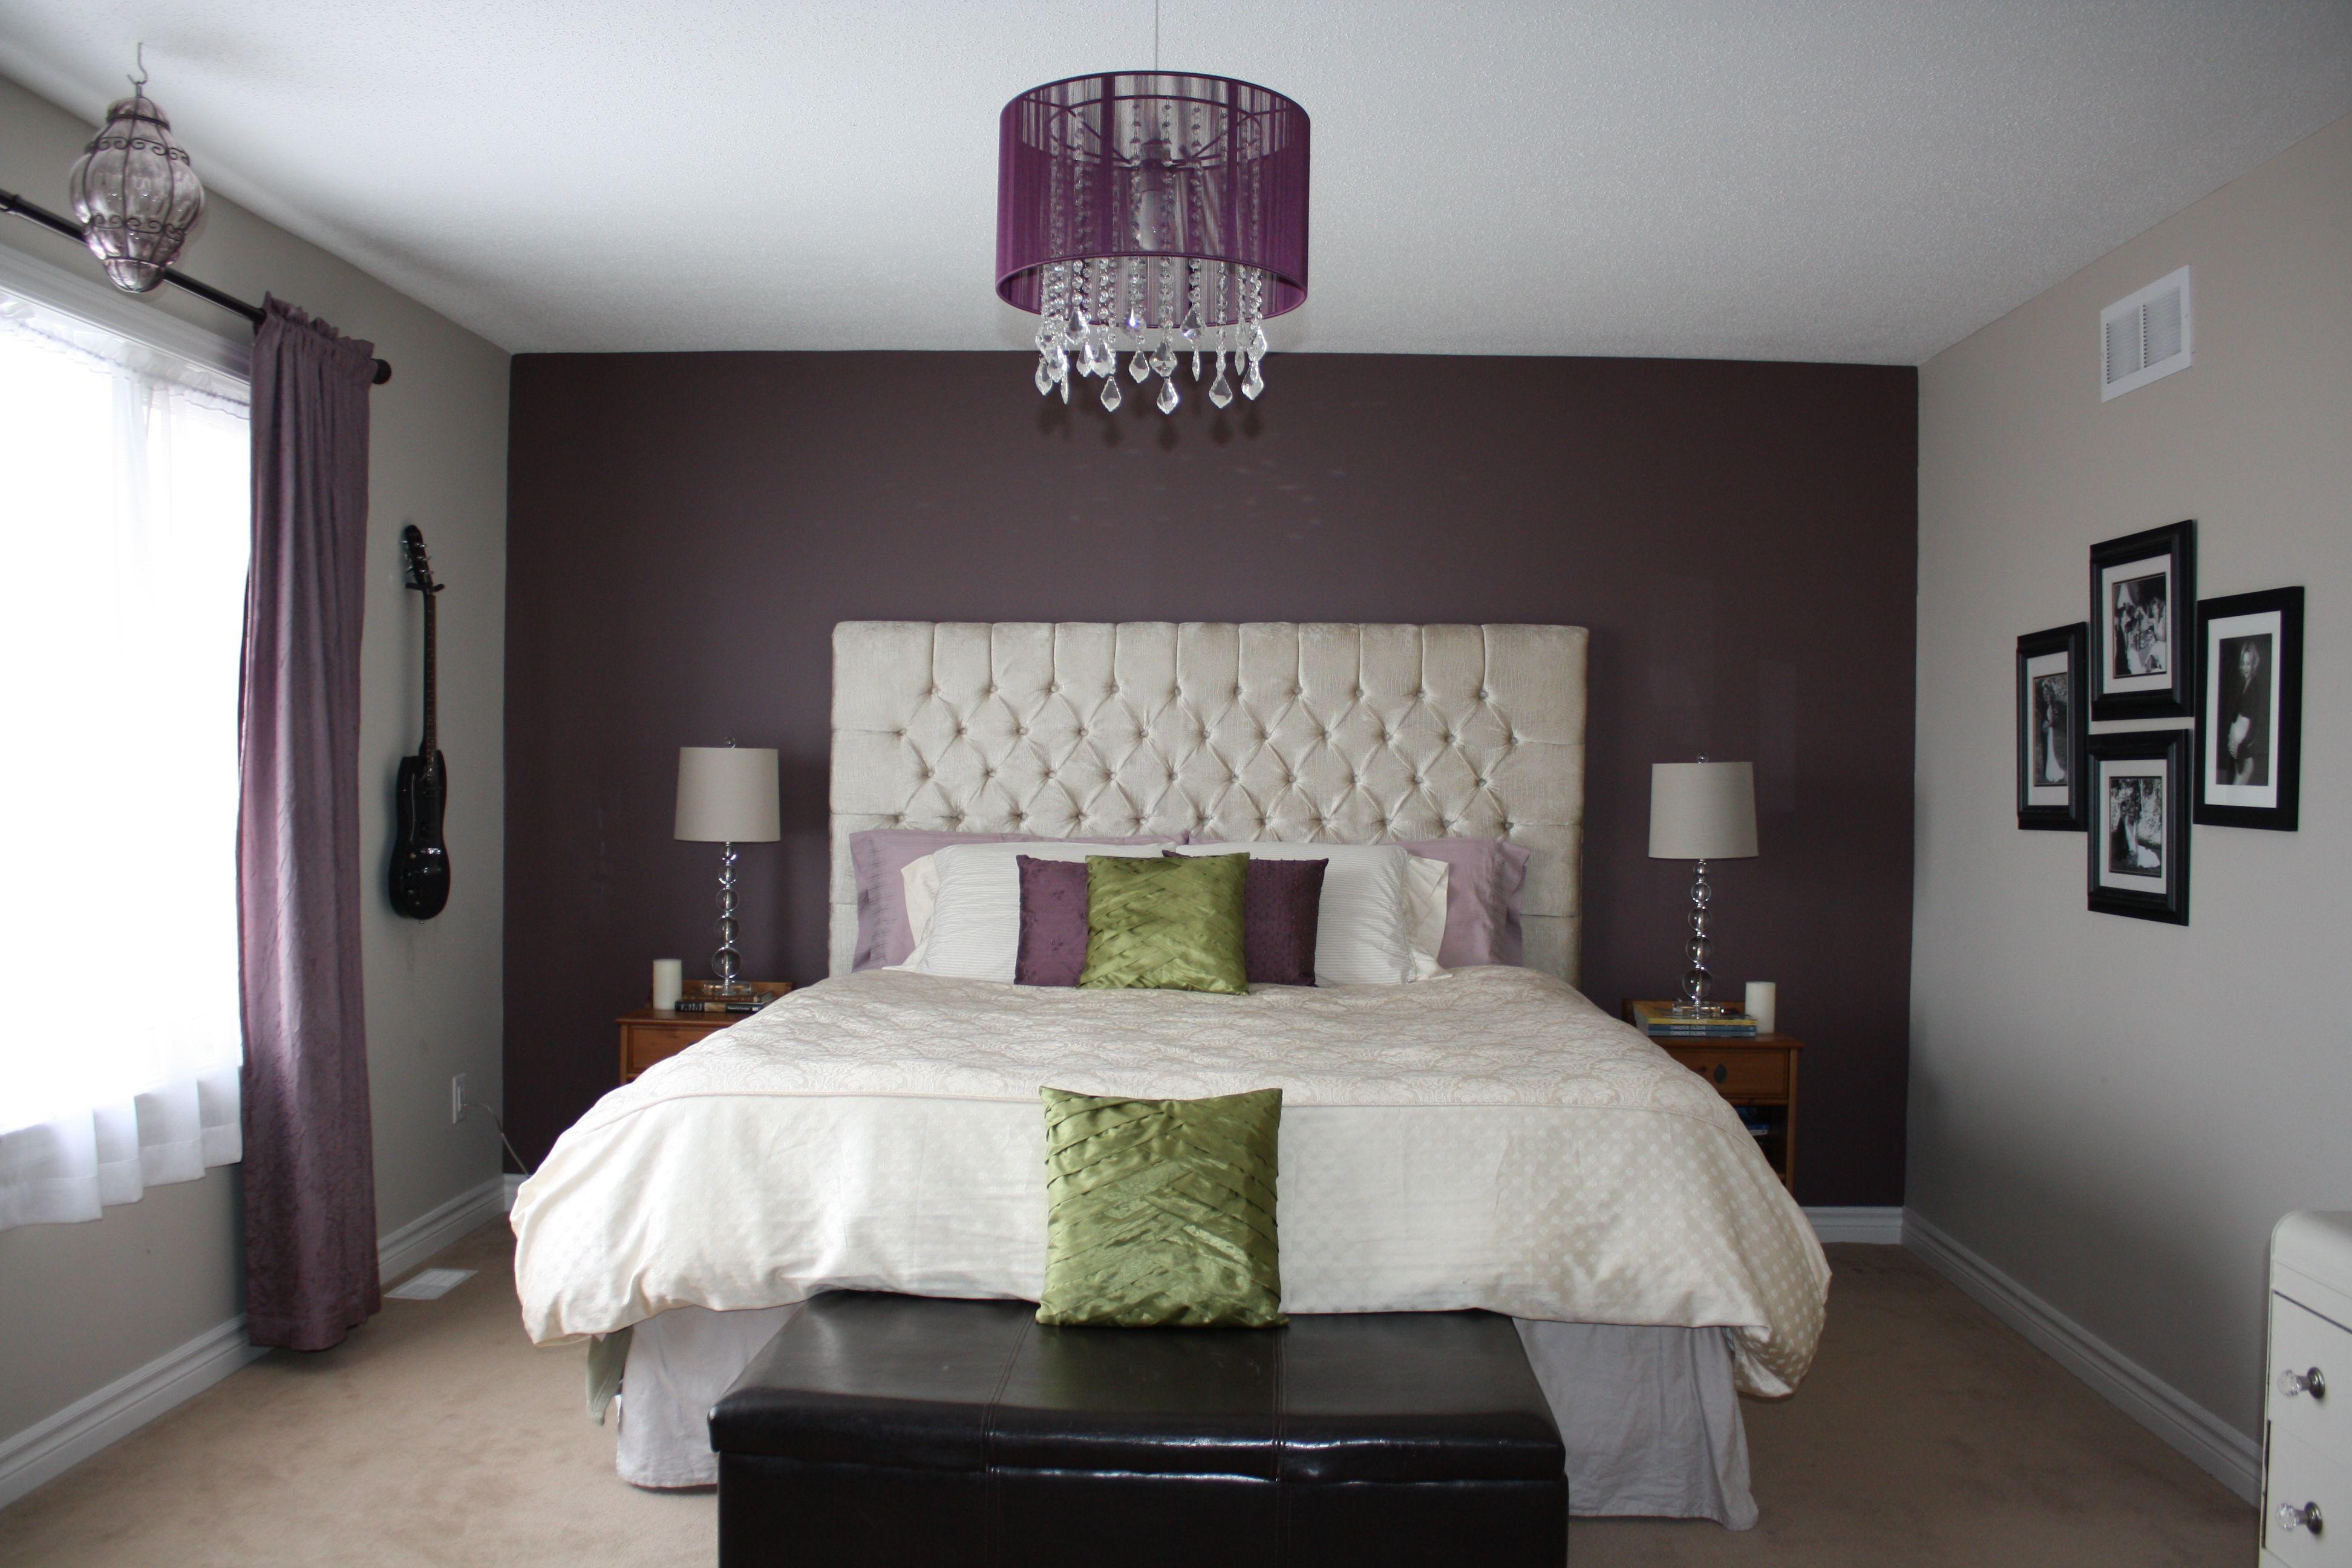 Master bedroom headboard design ideas  My Master bedroom makeover I made this King sized diamond tufted